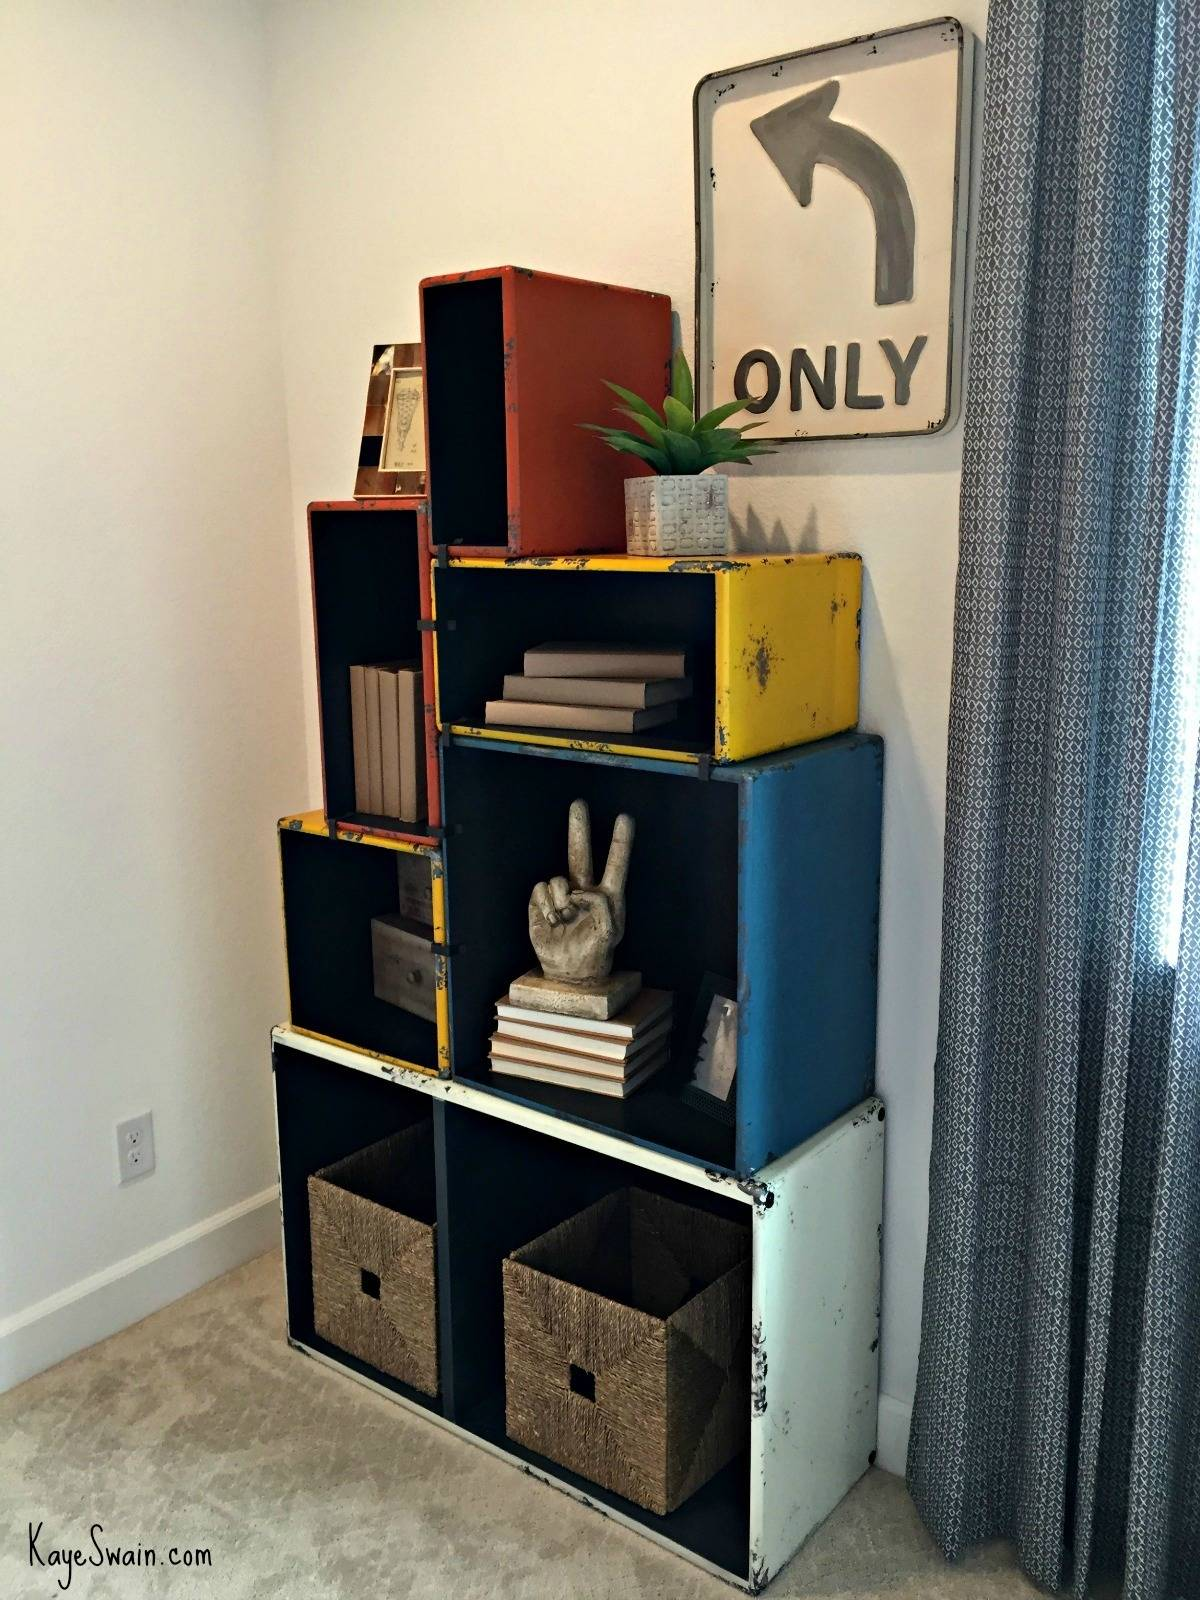 Kaye Swain Sacramento area REALTOR blogger sharing New Home construction model home staging decor in Roseville CA